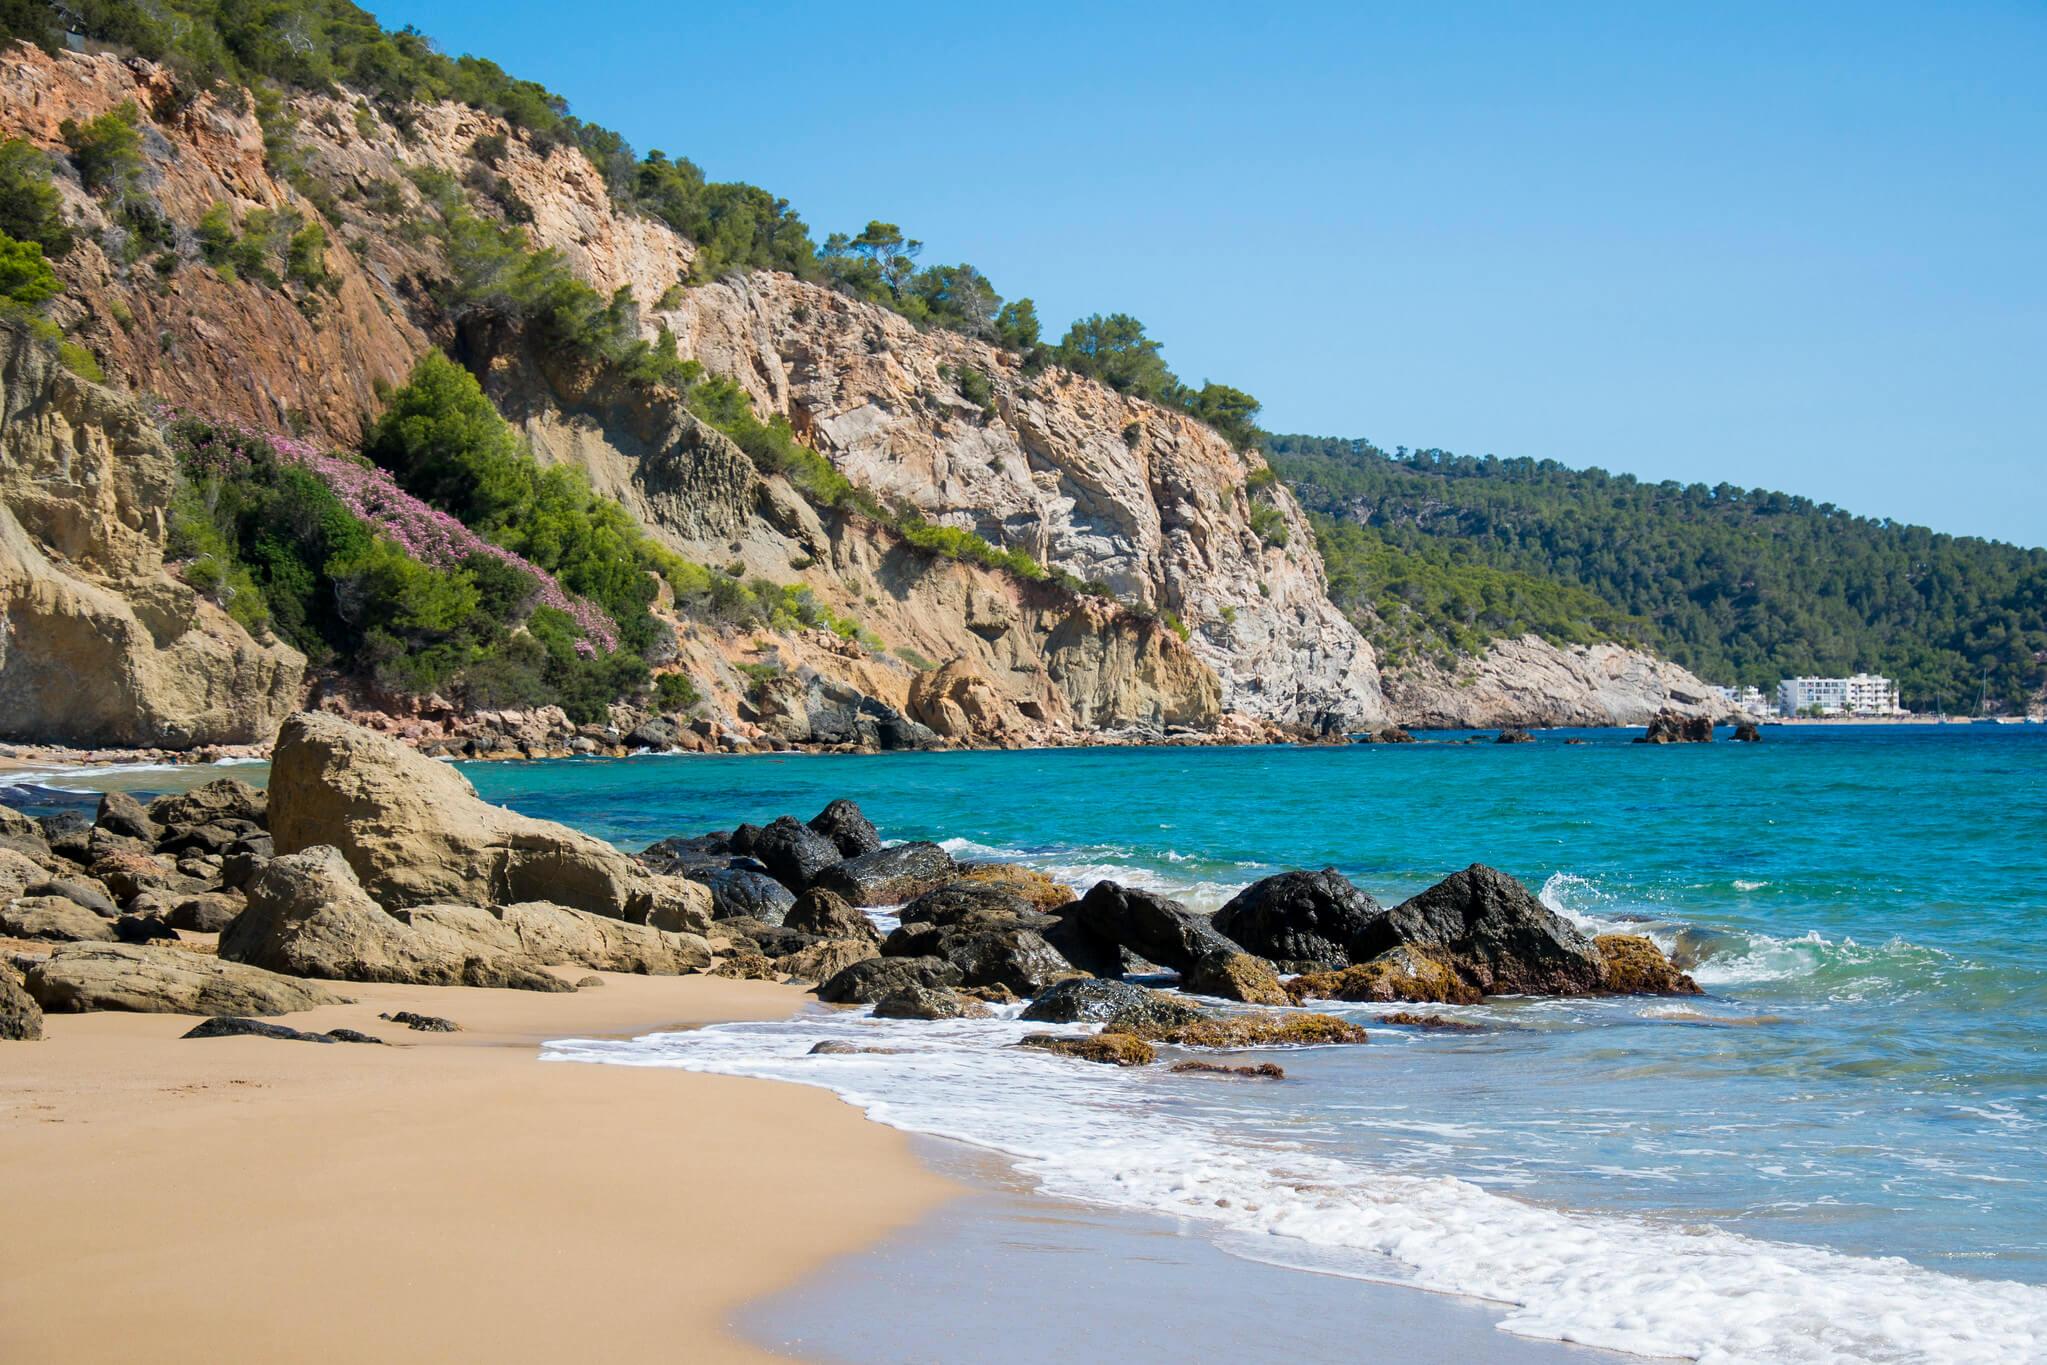 https://www.white-ibiza.com/wp-content/uploads/2020/03/ibiza-beaches-aguas-blancas-02.jpg